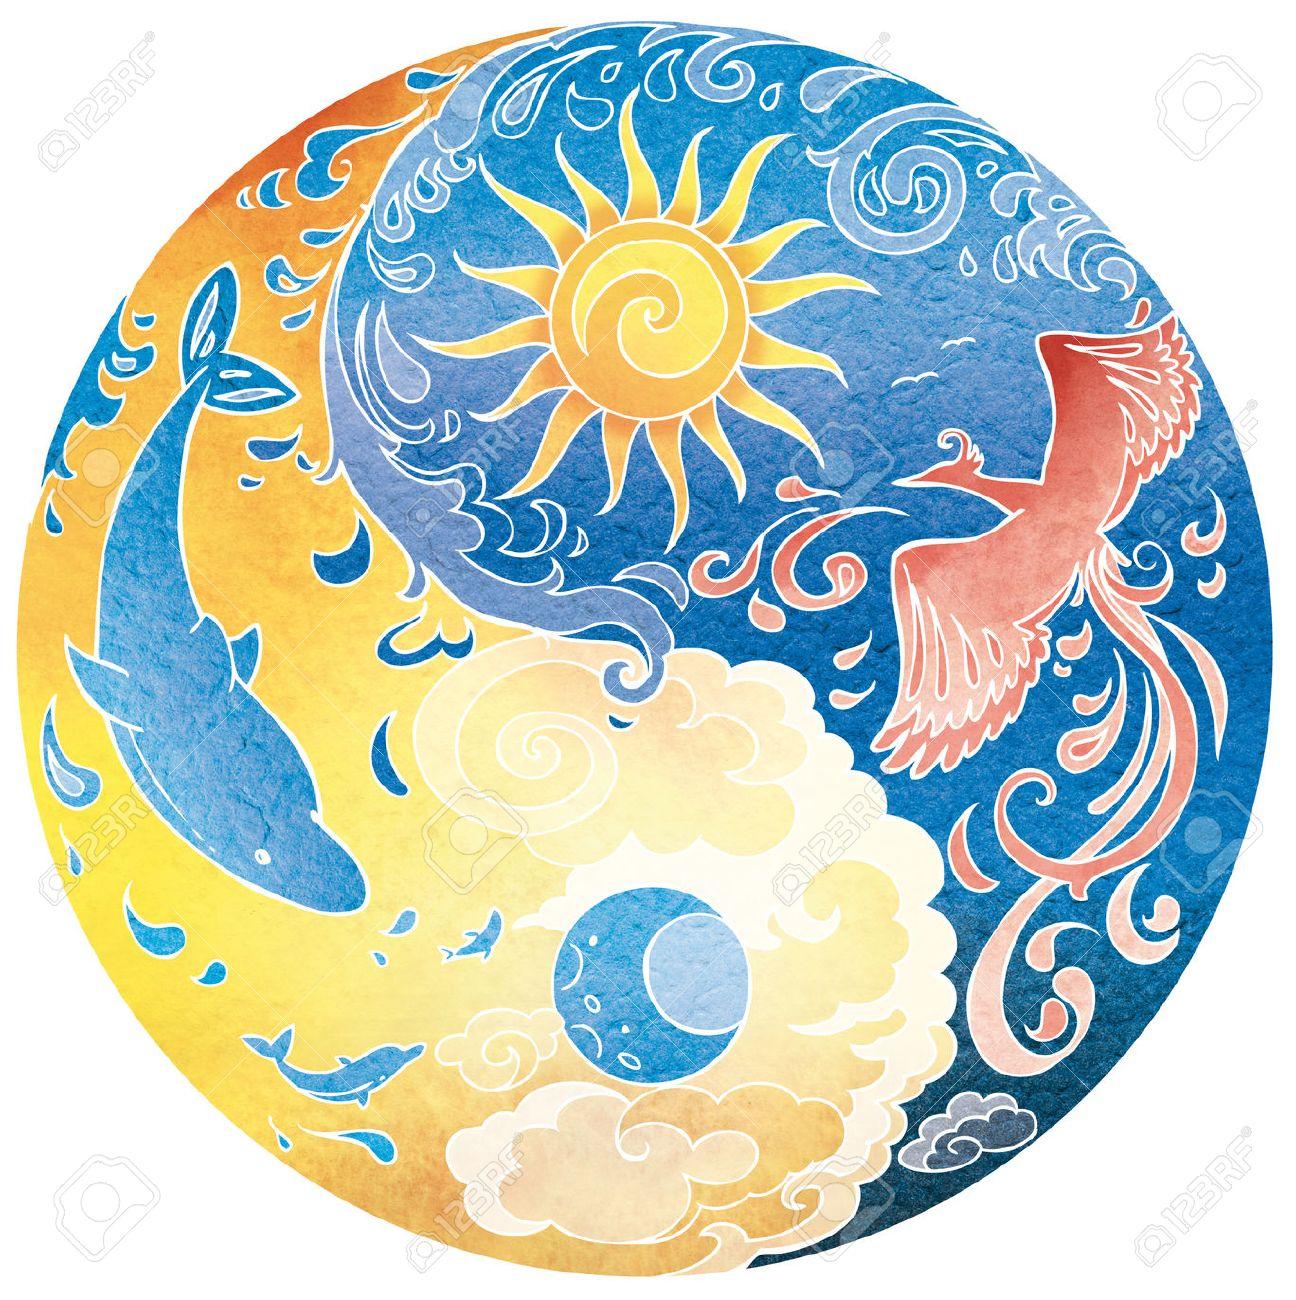 Tao Sri Amma Bhagavan Diksha mandala. Night and day. Stock Photo - 43566449